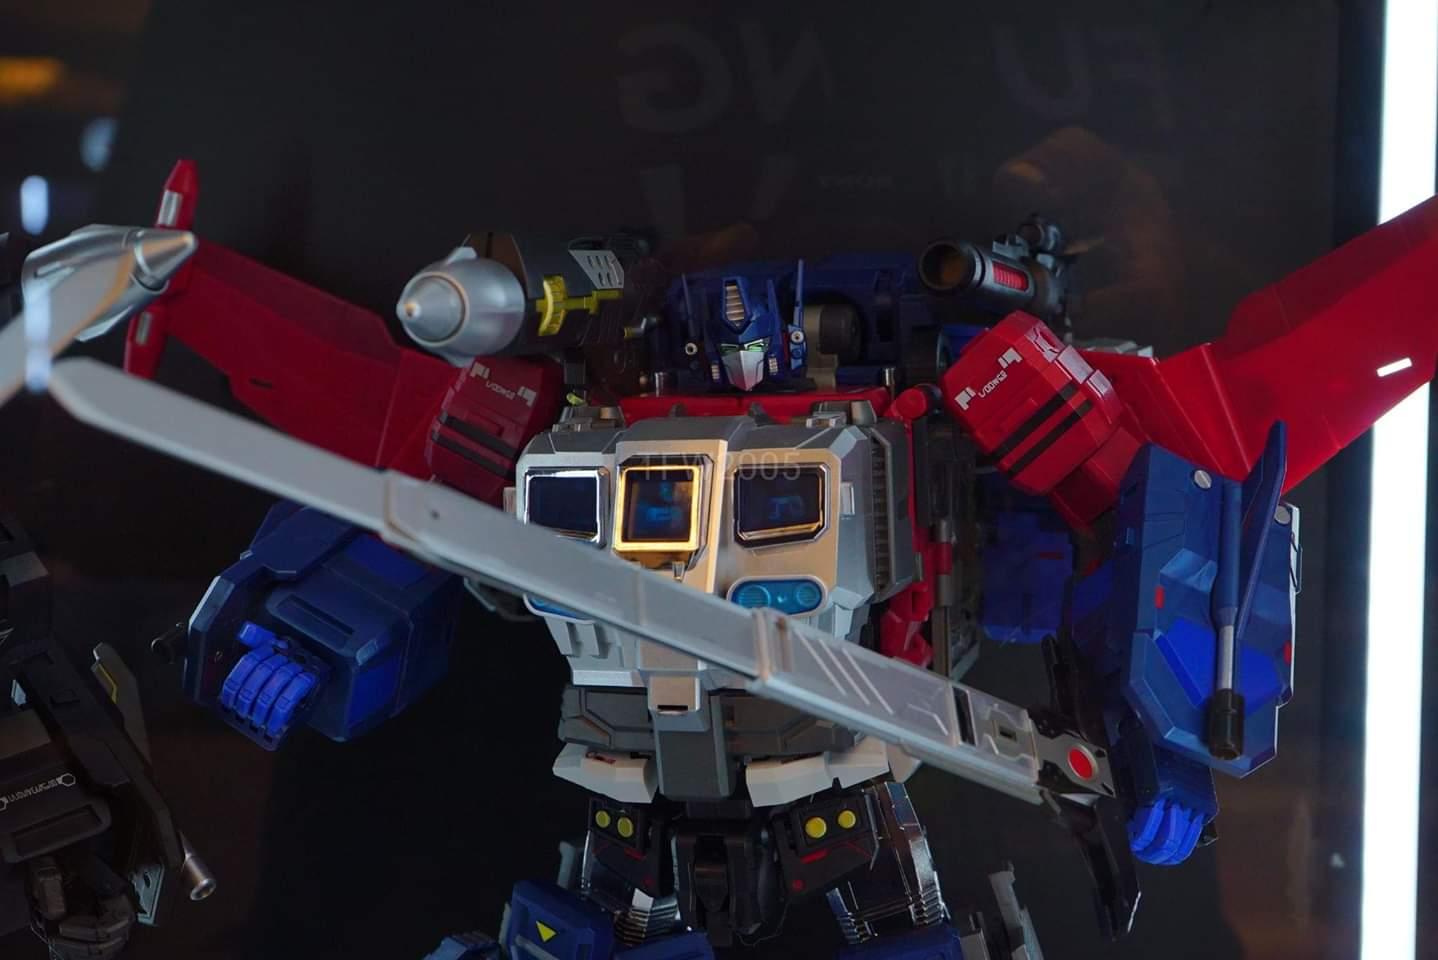 [FansHobby] Produit Tiers - MB-06 Power Baser (aka Powermaster Optimus) + MB-11 God Armour (aka Godbomber) - TF Masterforce - Page 4 SlJIwWGS_o